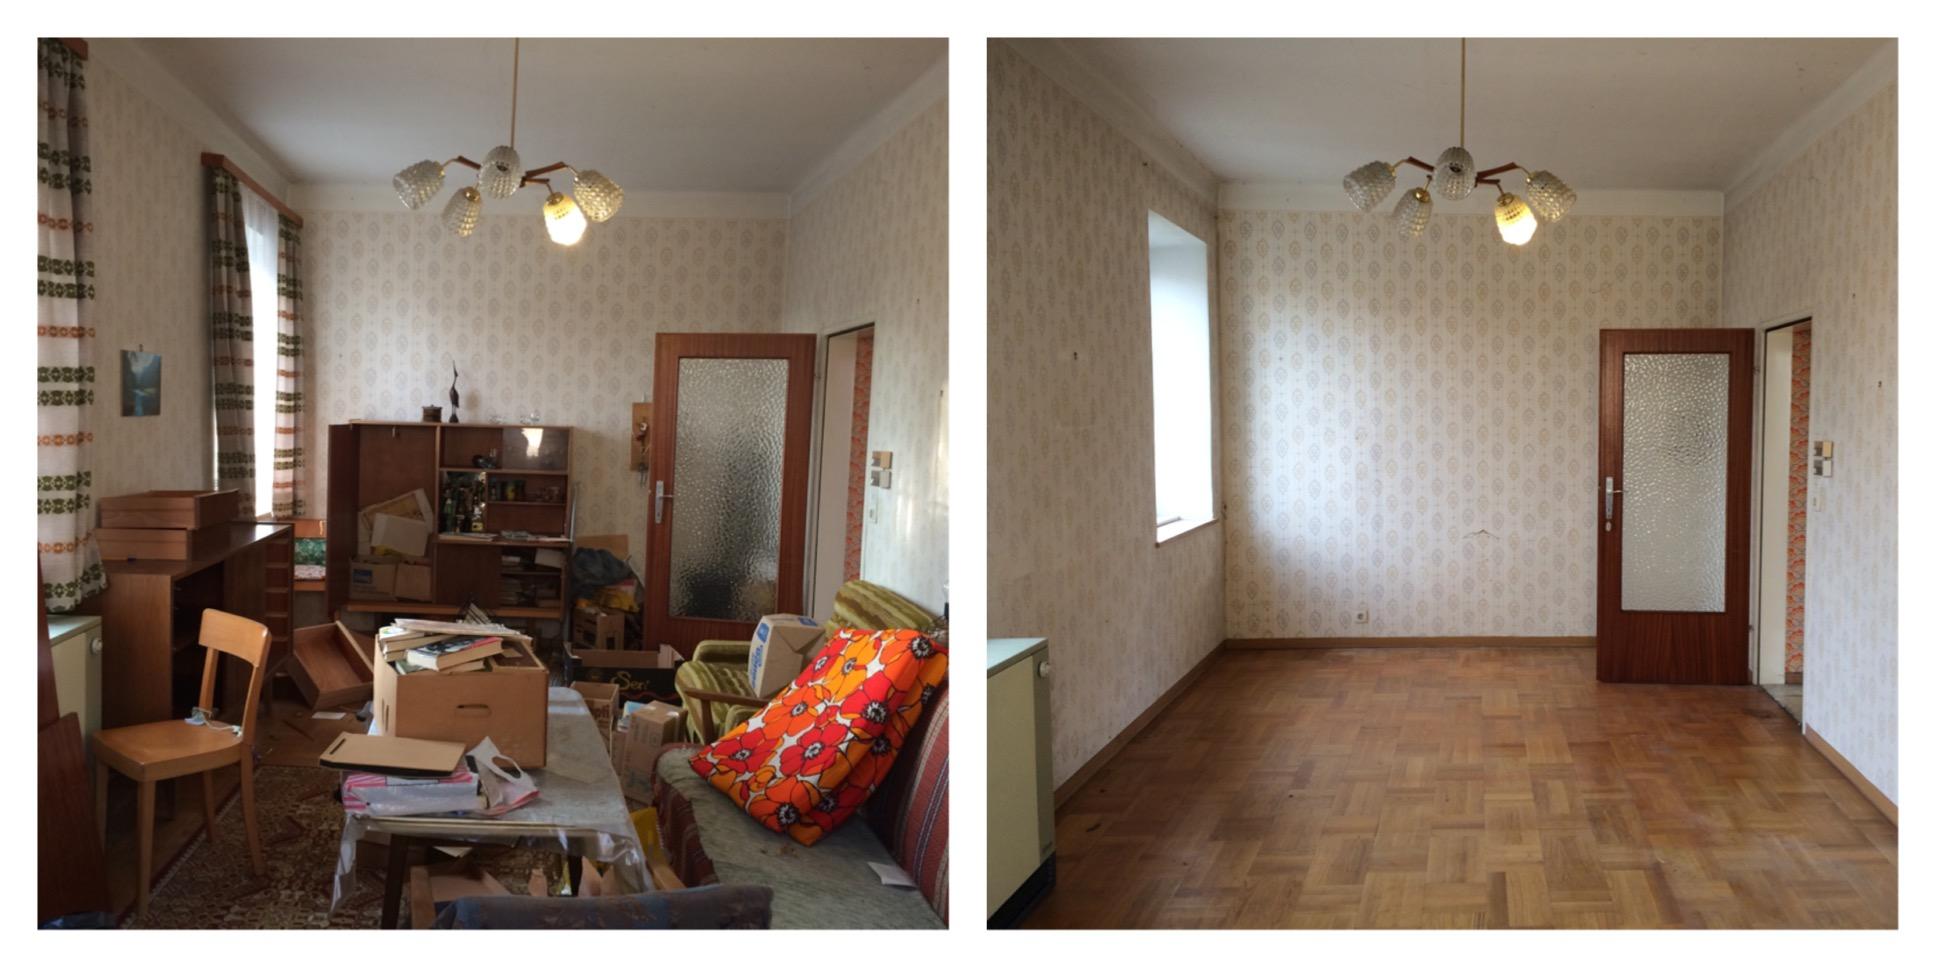 wohnungsr umung entr mpelung linz und ober sterreich mytrans. Black Bedroom Furniture Sets. Home Design Ideas